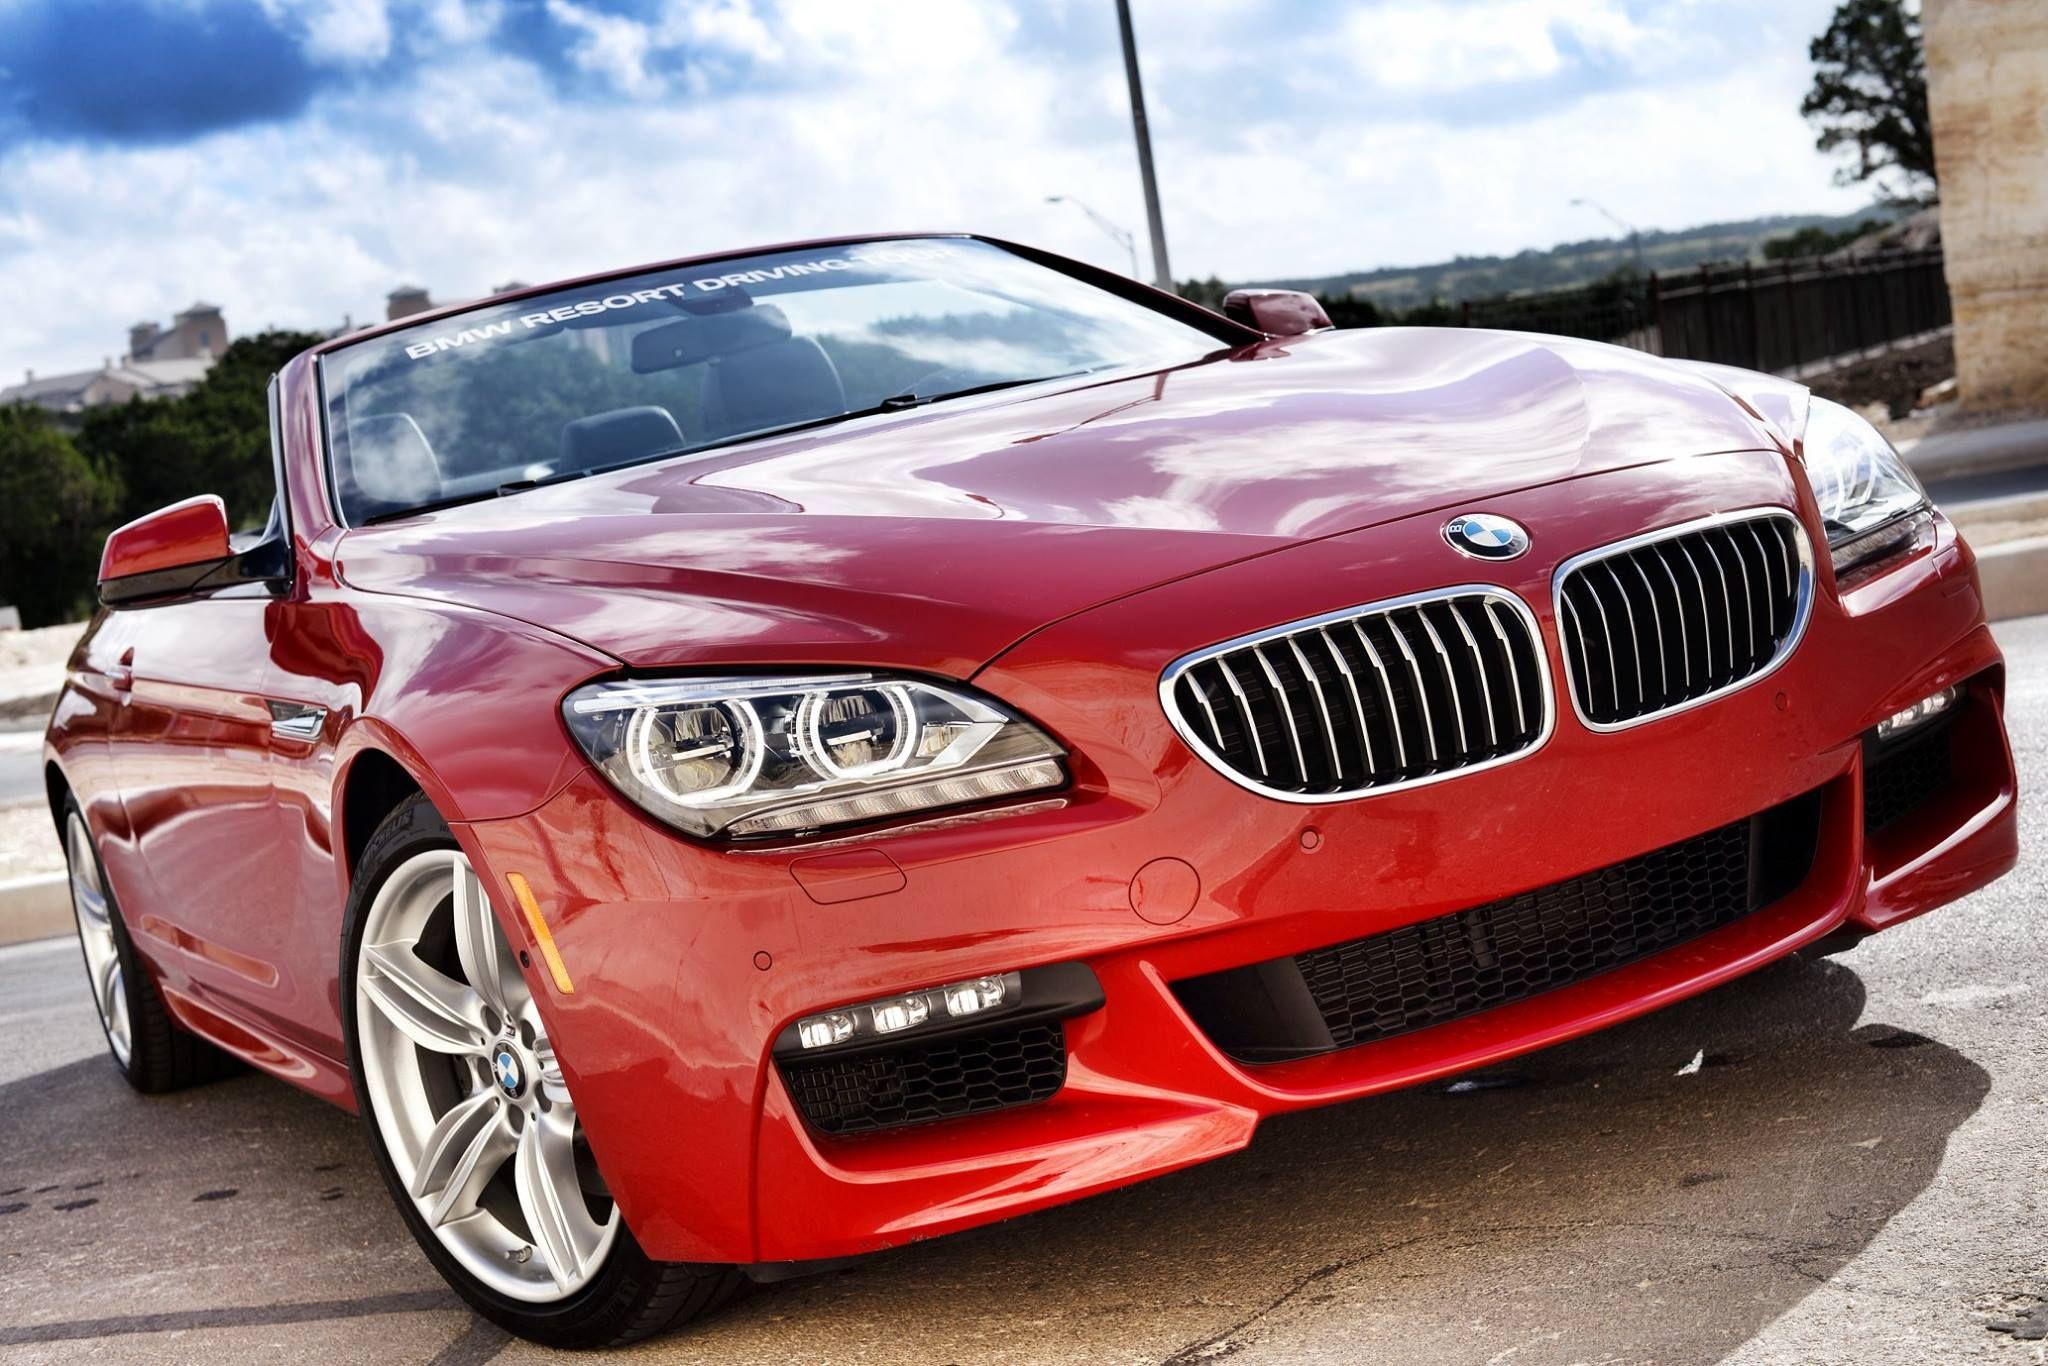 JW Marriott San Antonio Offers Guests Free BMW In Deep H2O